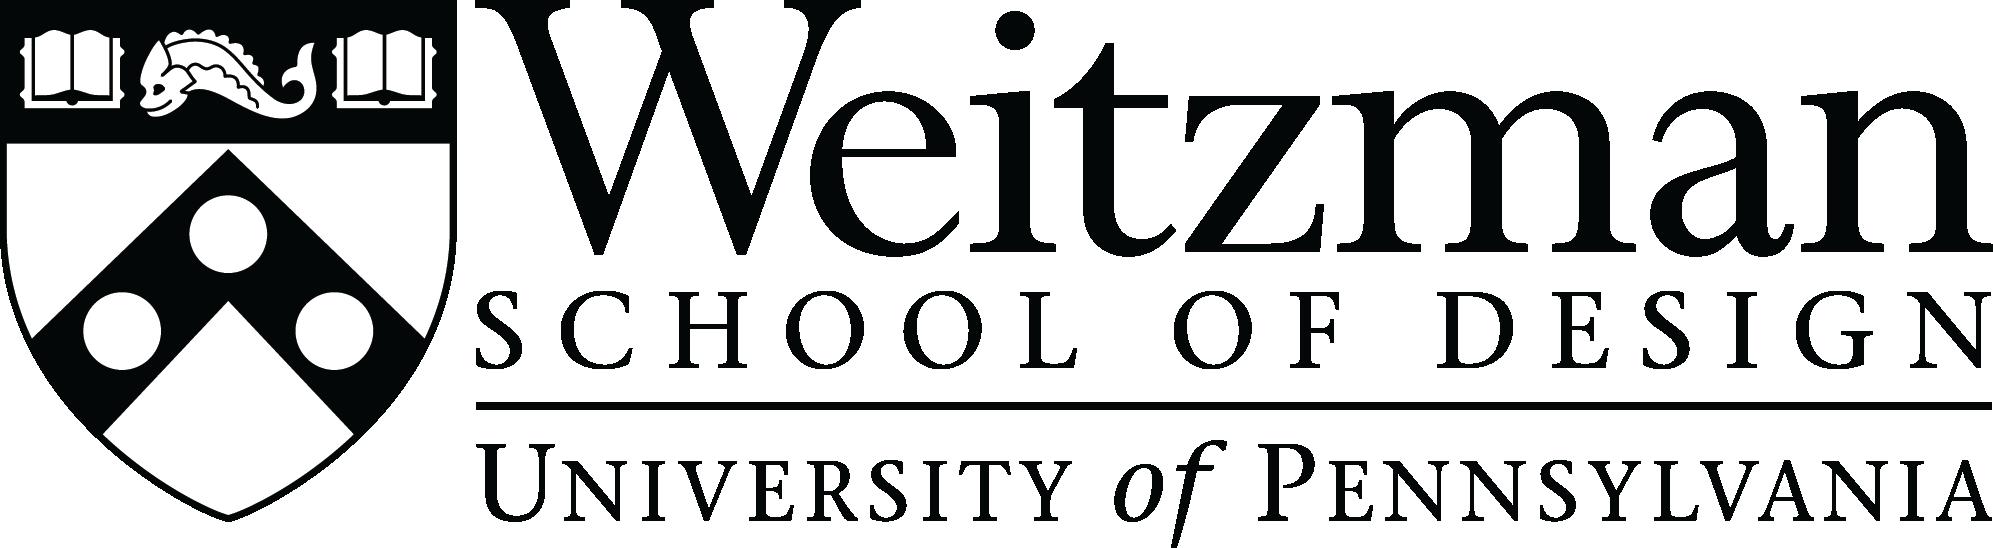 The University of Pennsylvania Design